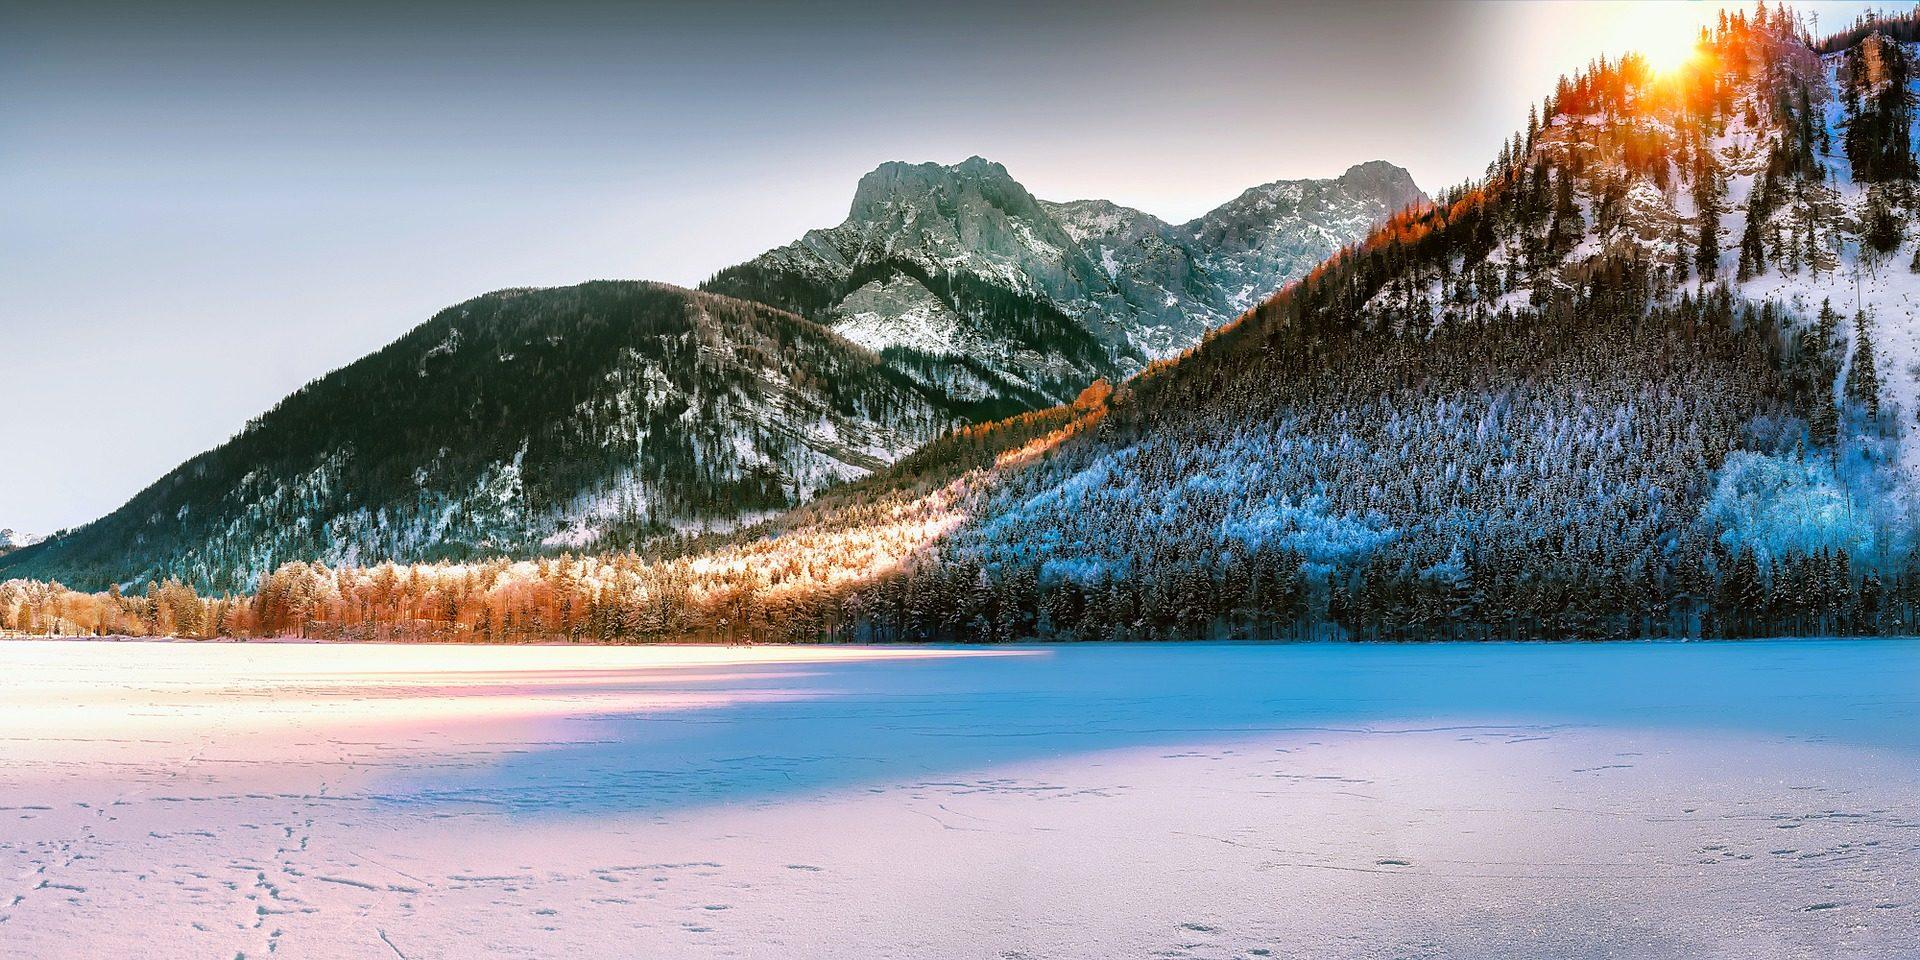 Montañas, χιονόπτωση, χιόνι, Αυγή, Λίμνη, παγωτό, Κυρ, ακτίνες - Wallpapers HD - Professor-falken.com